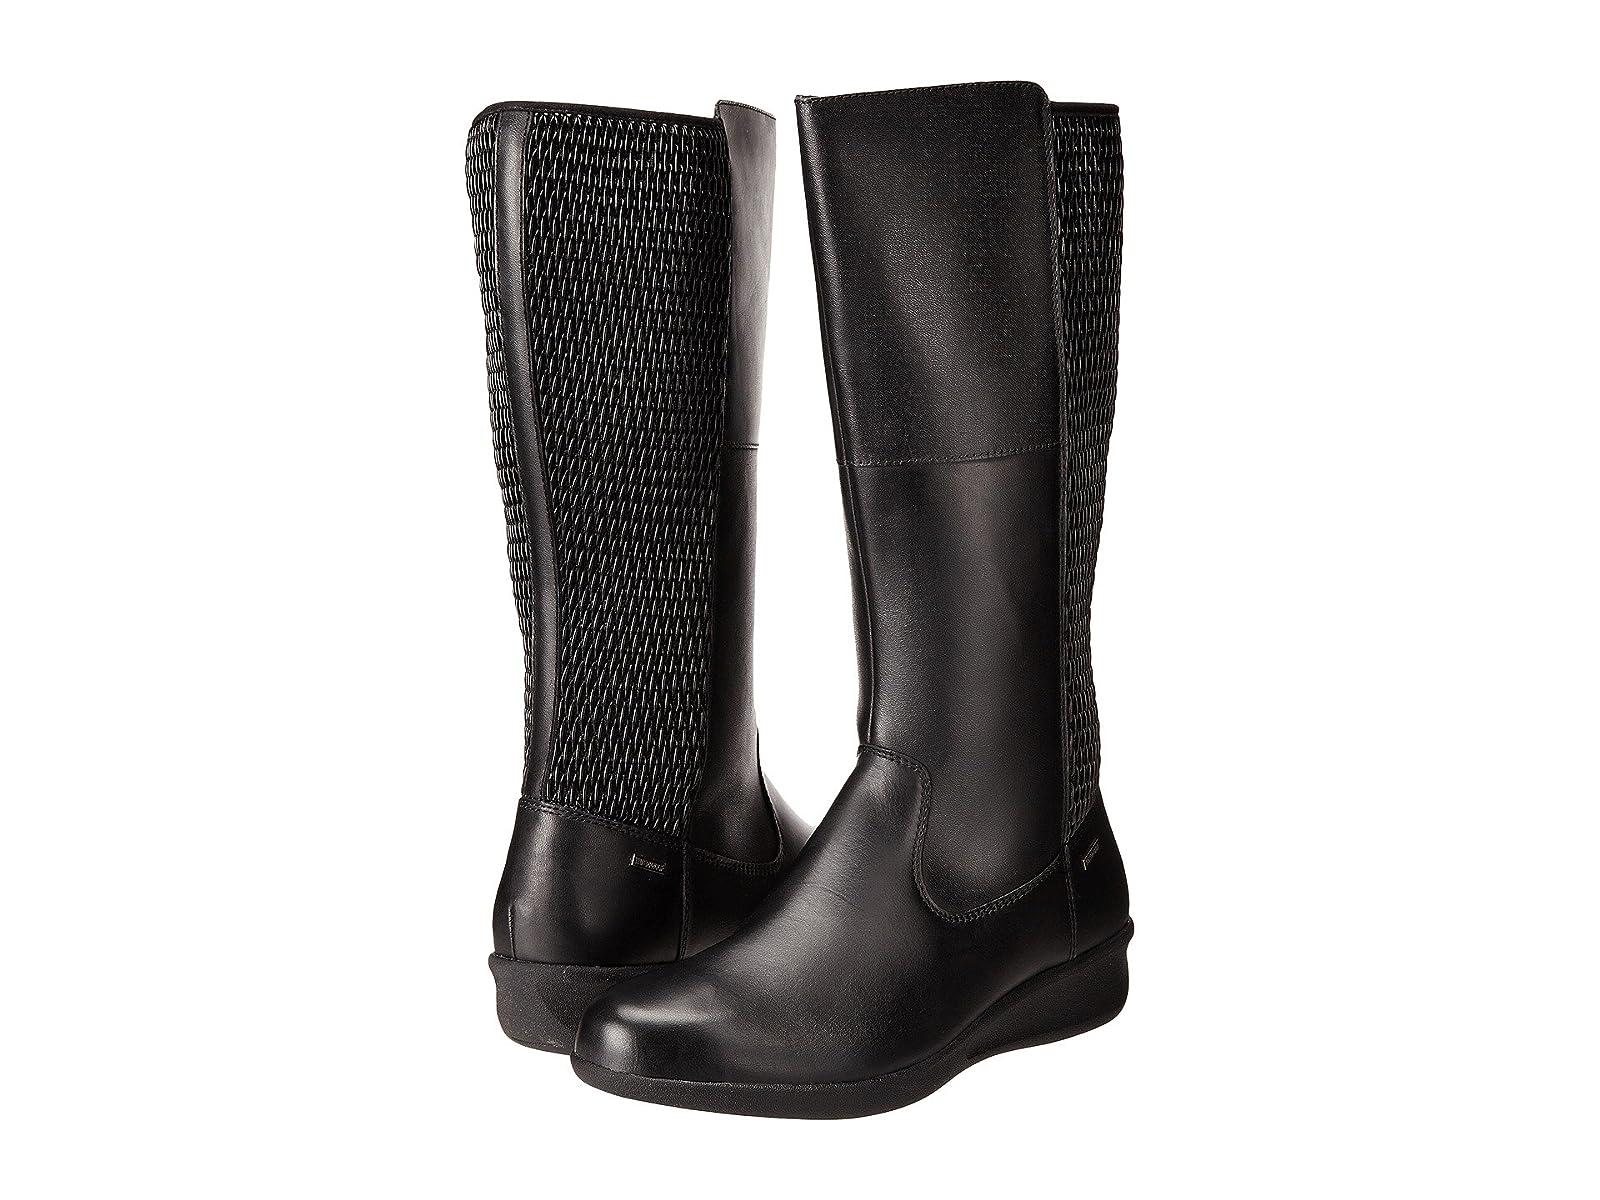 Aravon Lillian-ARCheap and distinctive eye-catching shoes